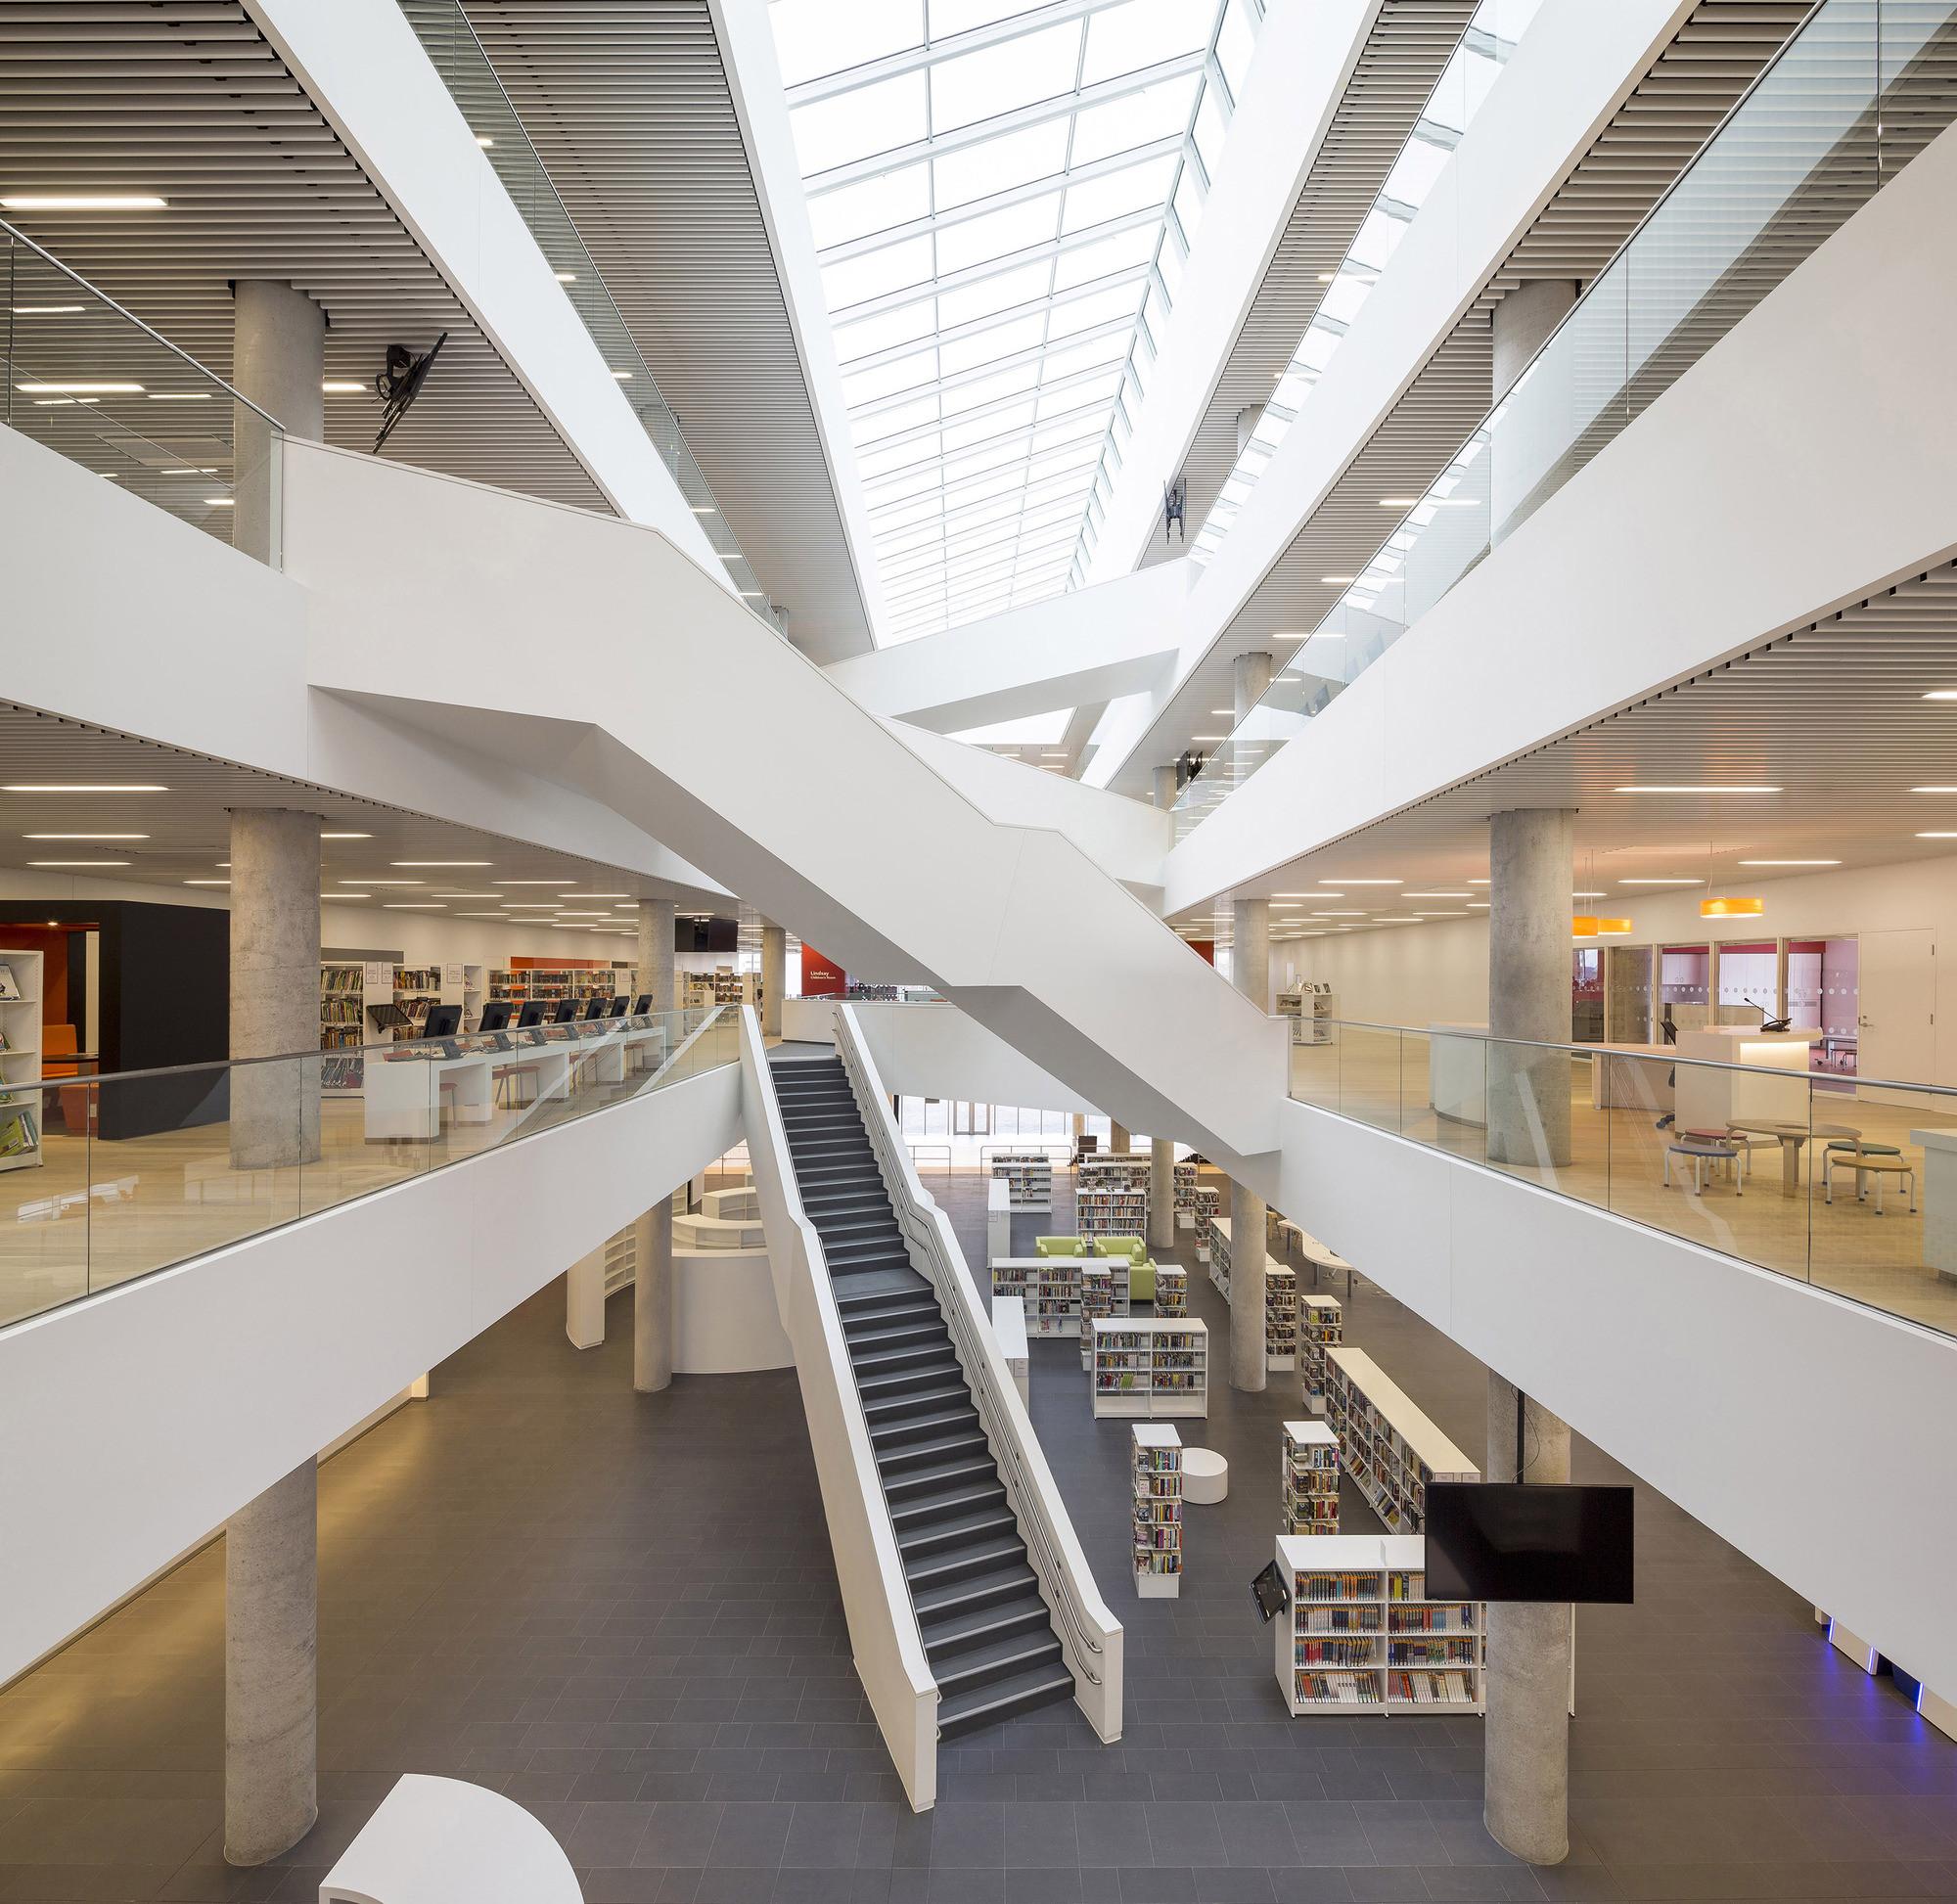 New Halifax Central Library / Schmidt Hammer Lassen + Fowler Bauld & Mitchell. Image © Adam Mørk